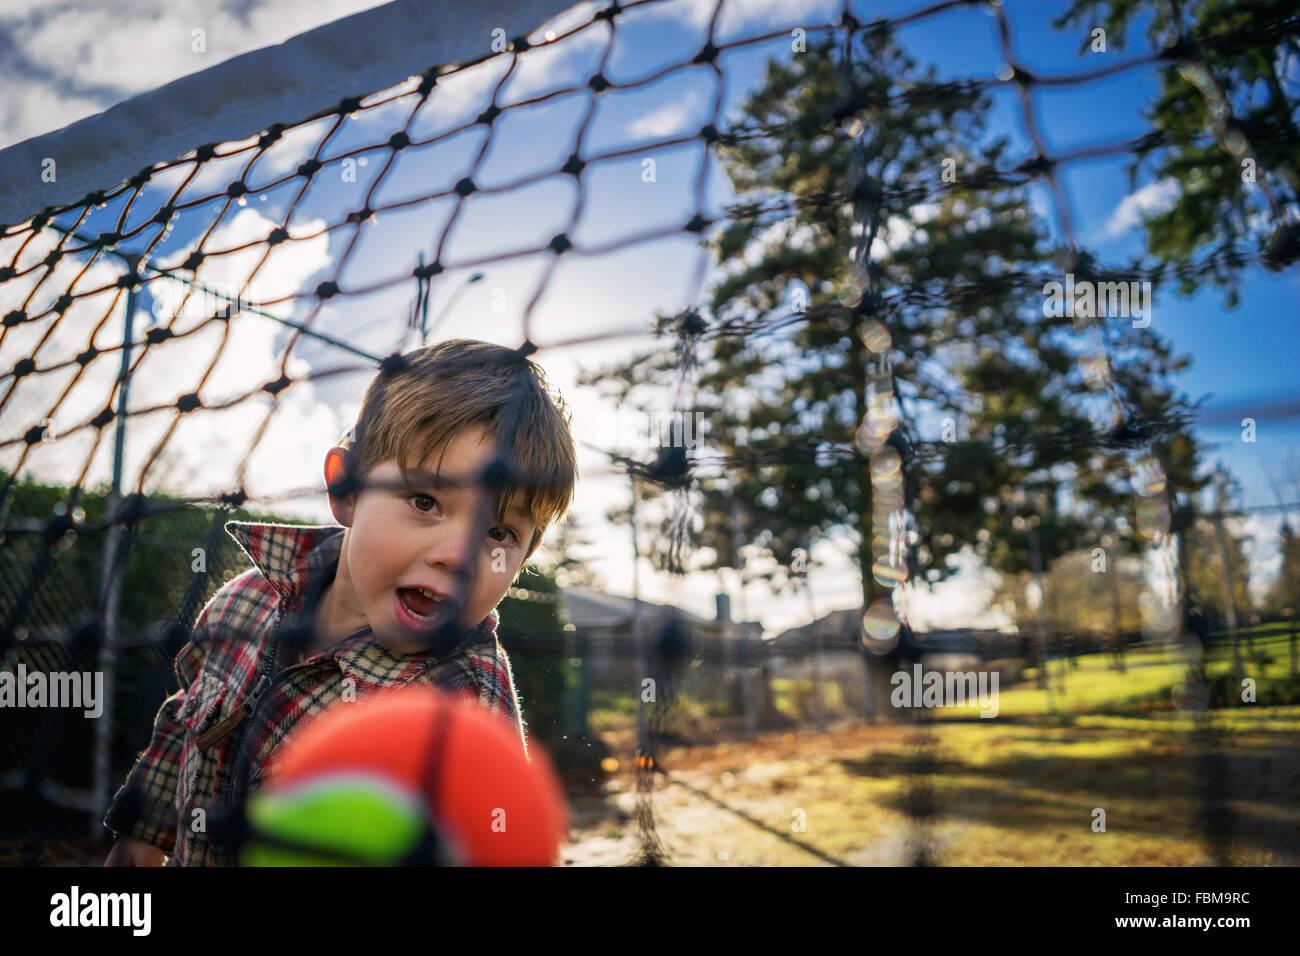 View through a net of a boy throwing tennis ball - Stock Image